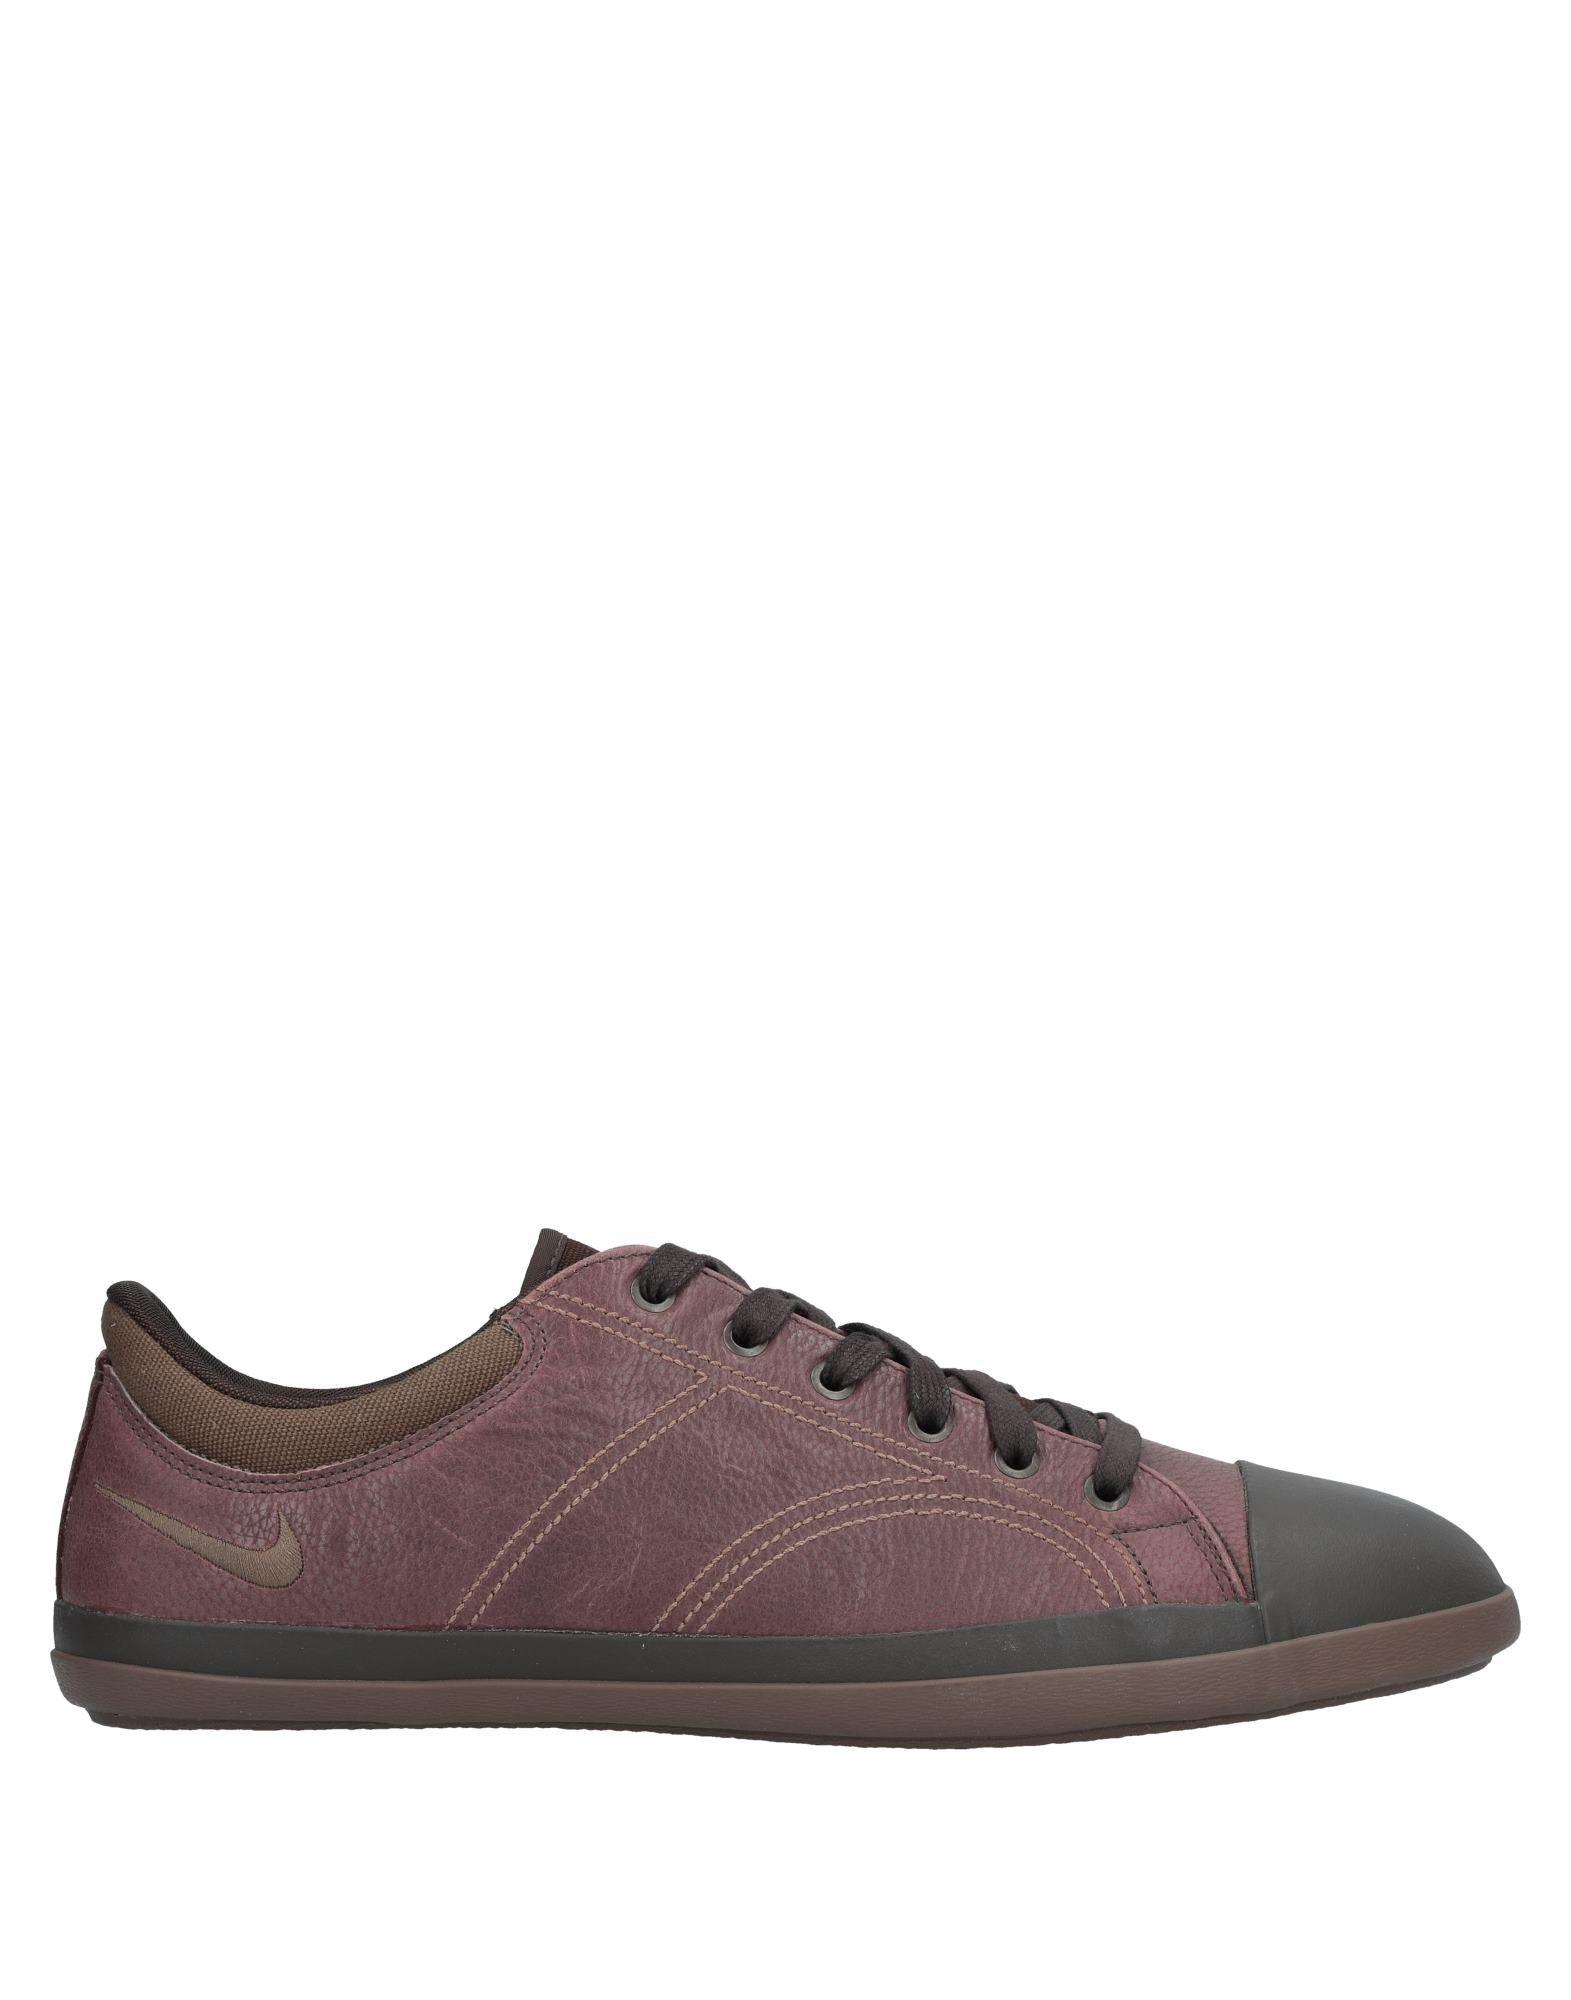 11529409IV Nike Sneakers Herren  11529409IV  922676